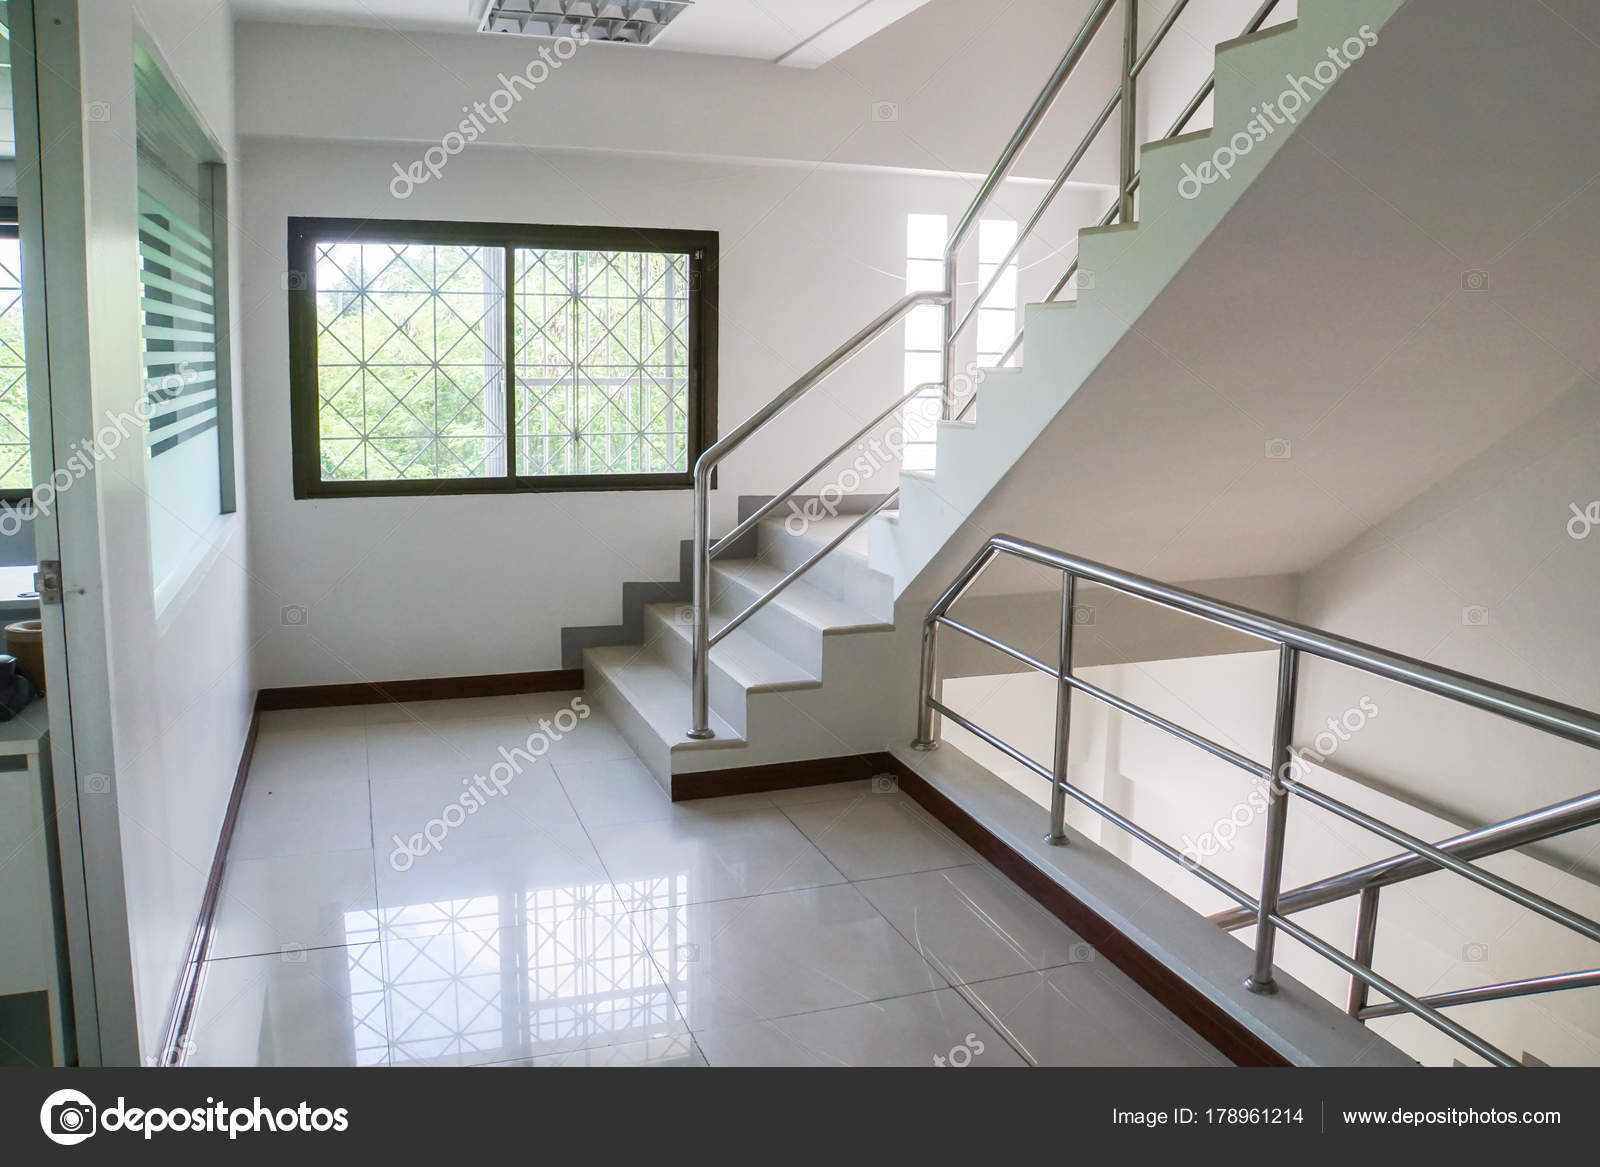 Interieur trap luxe woning u2014 stockfoto © jummie #178961214